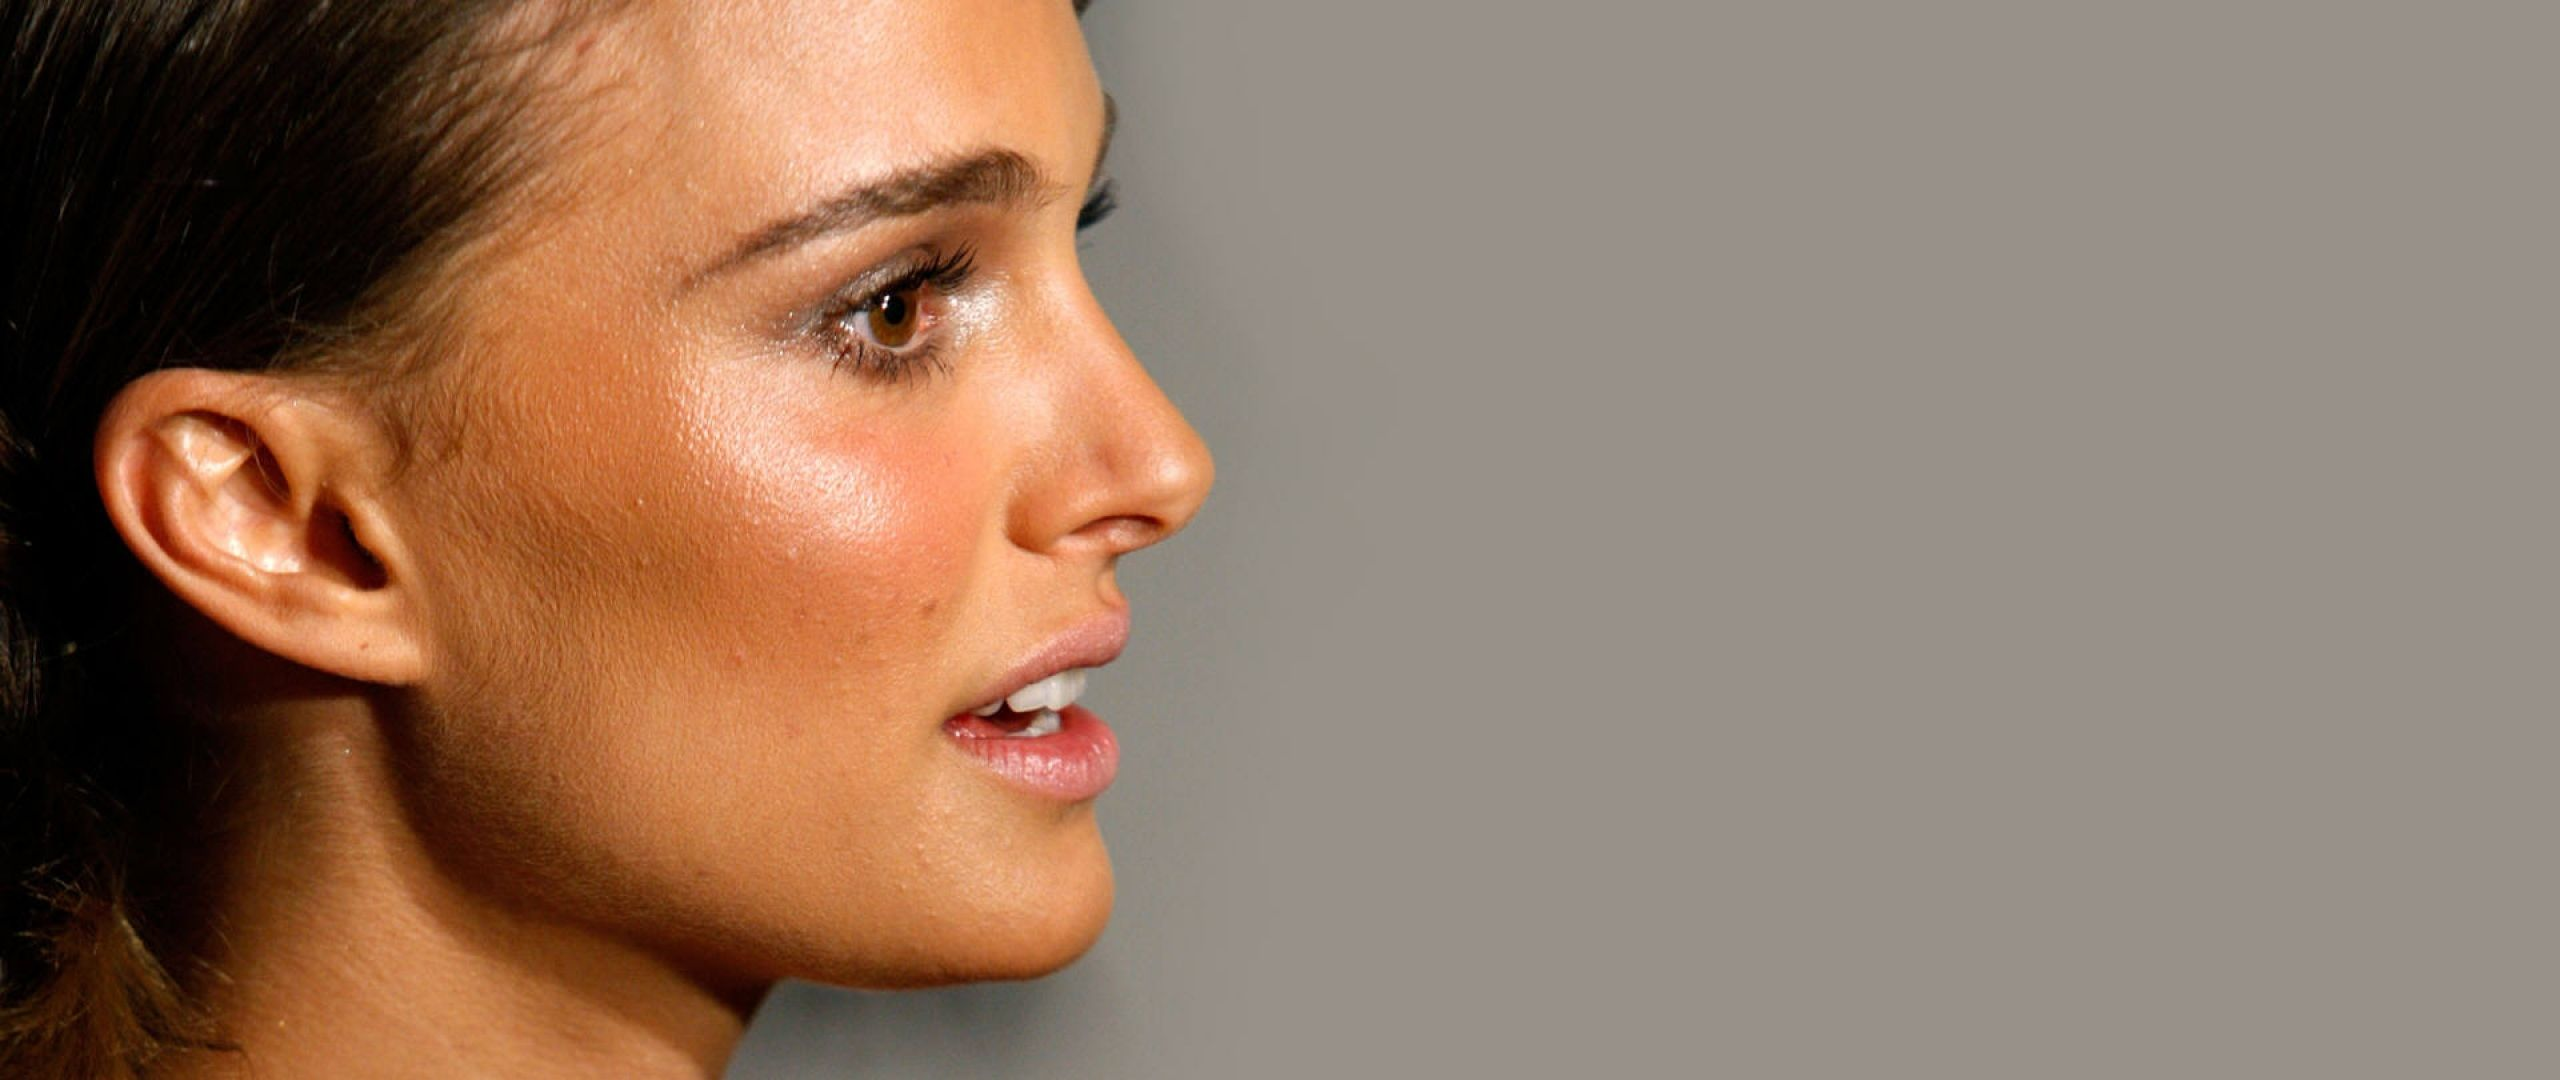 Natalie Portman Nose Profile